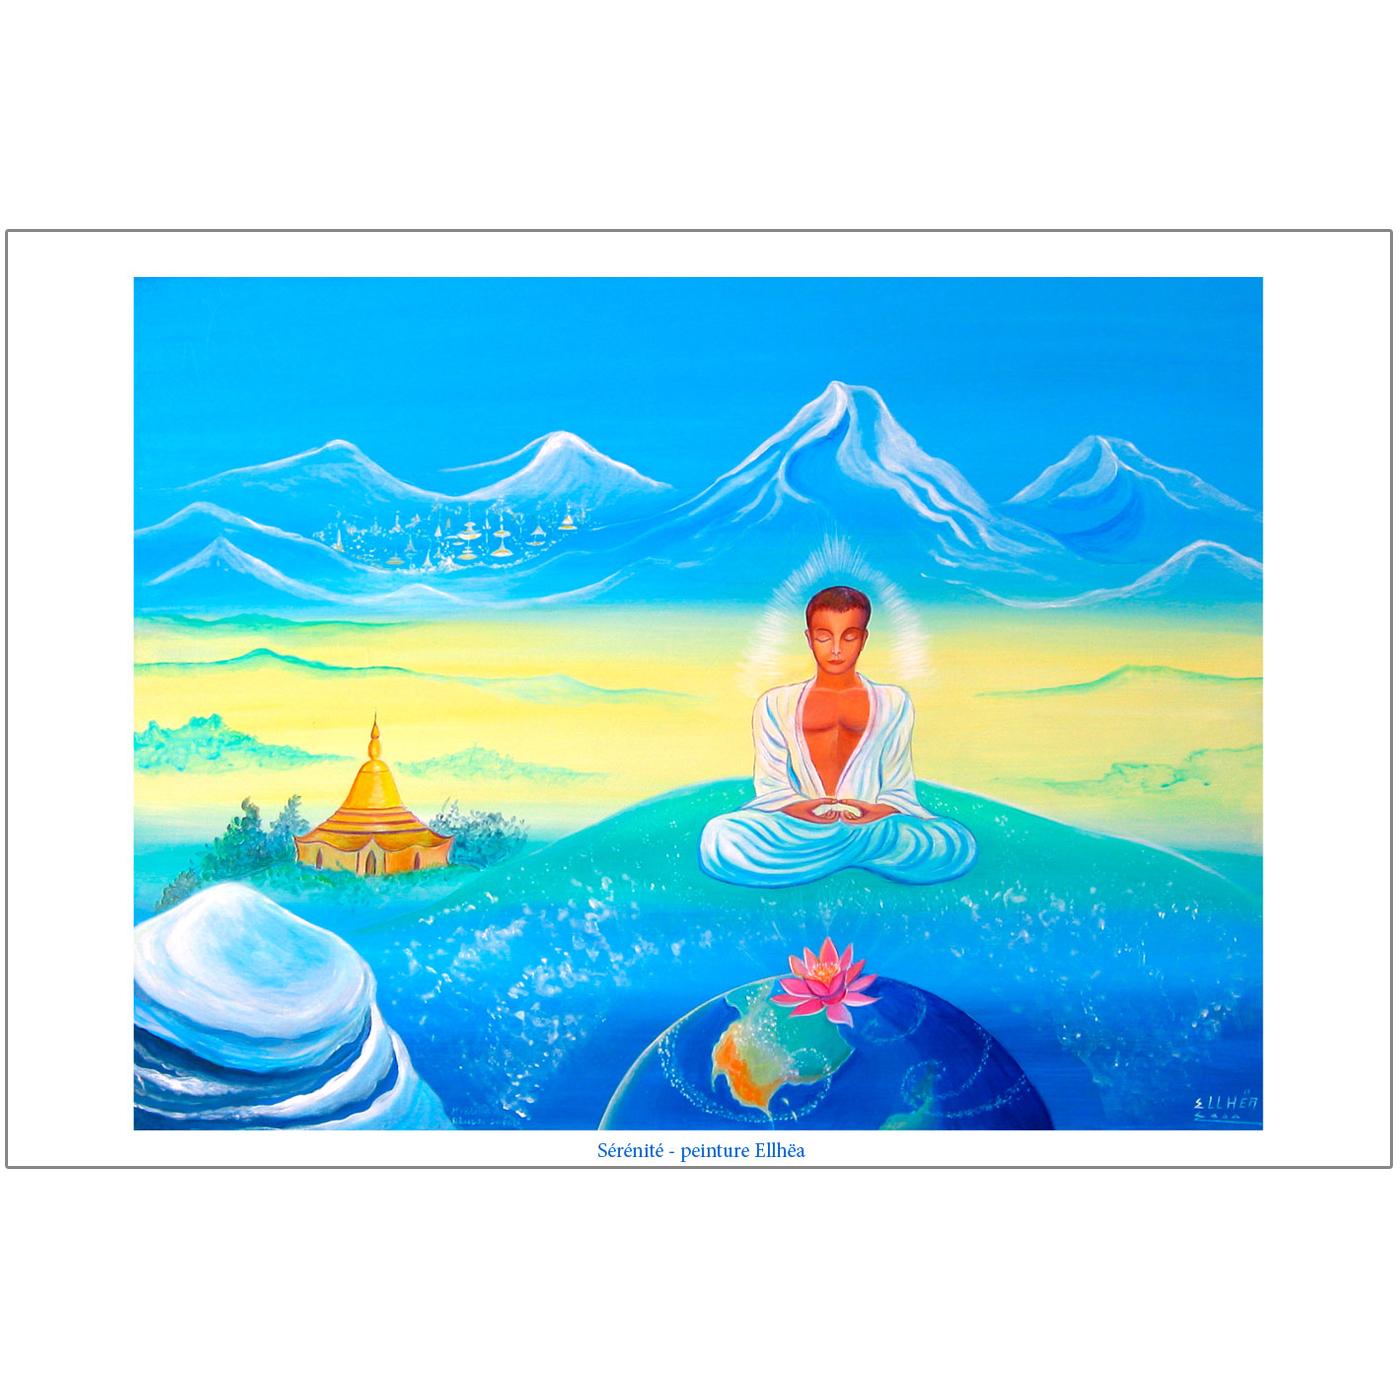 poster meditation serenite coryright ellhea-boutique-zen-style